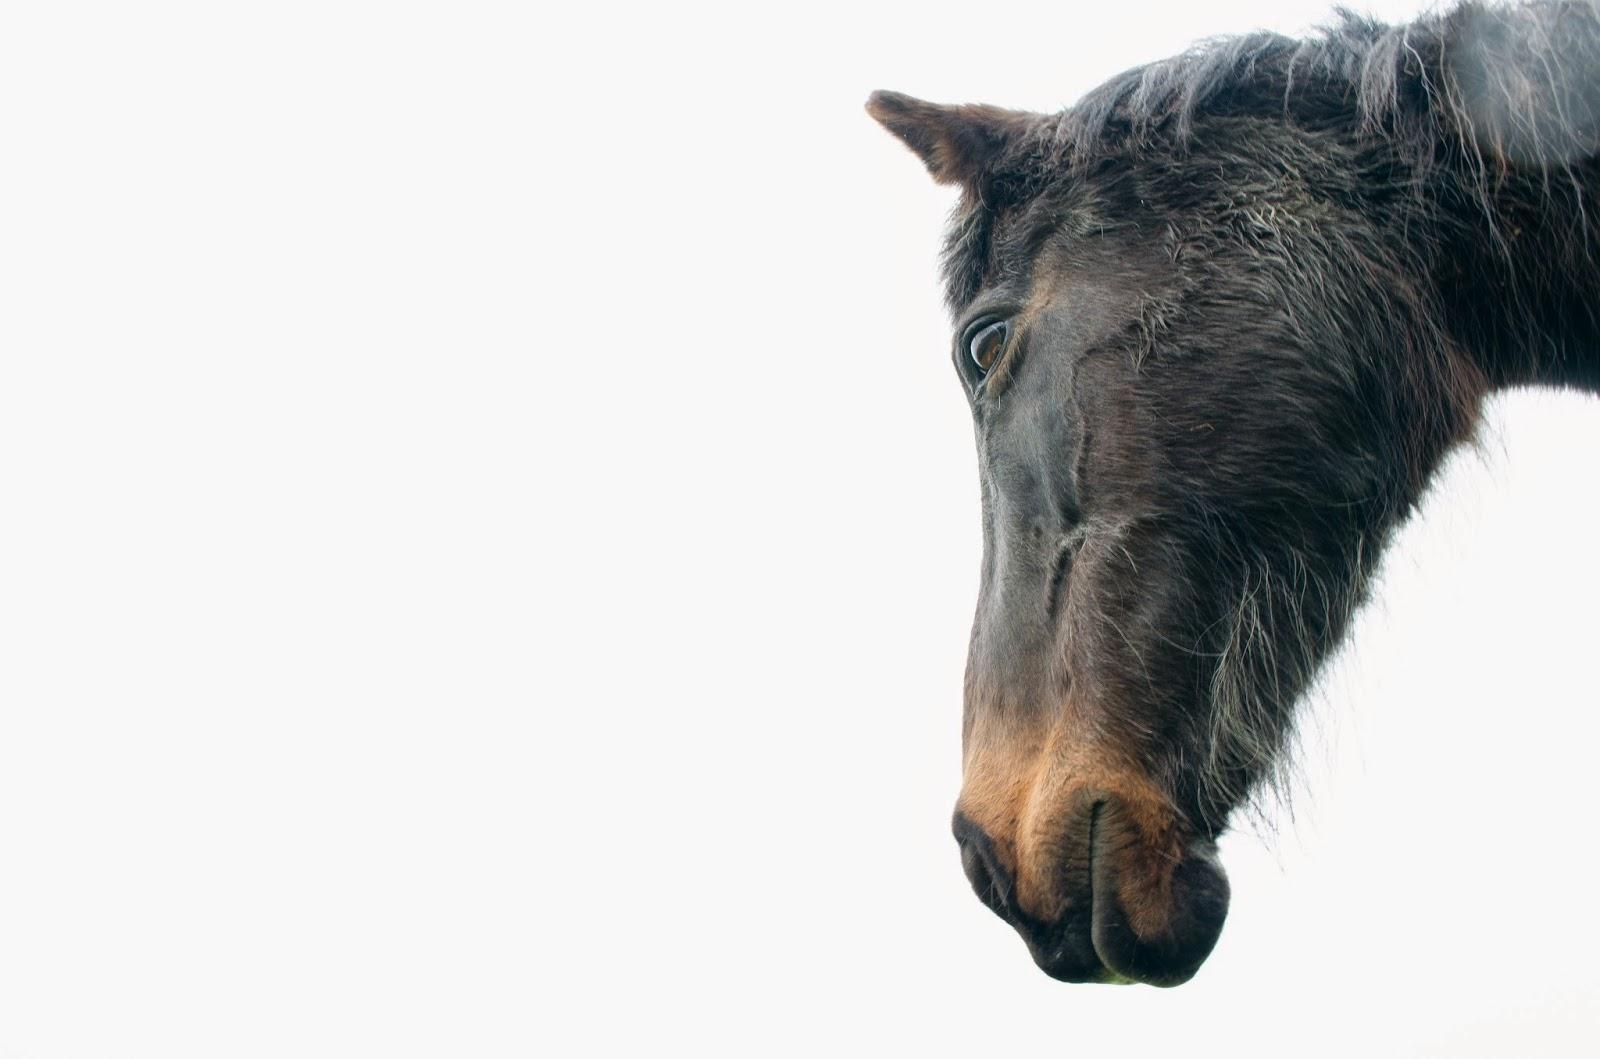 aesthetic fauna // aging mare